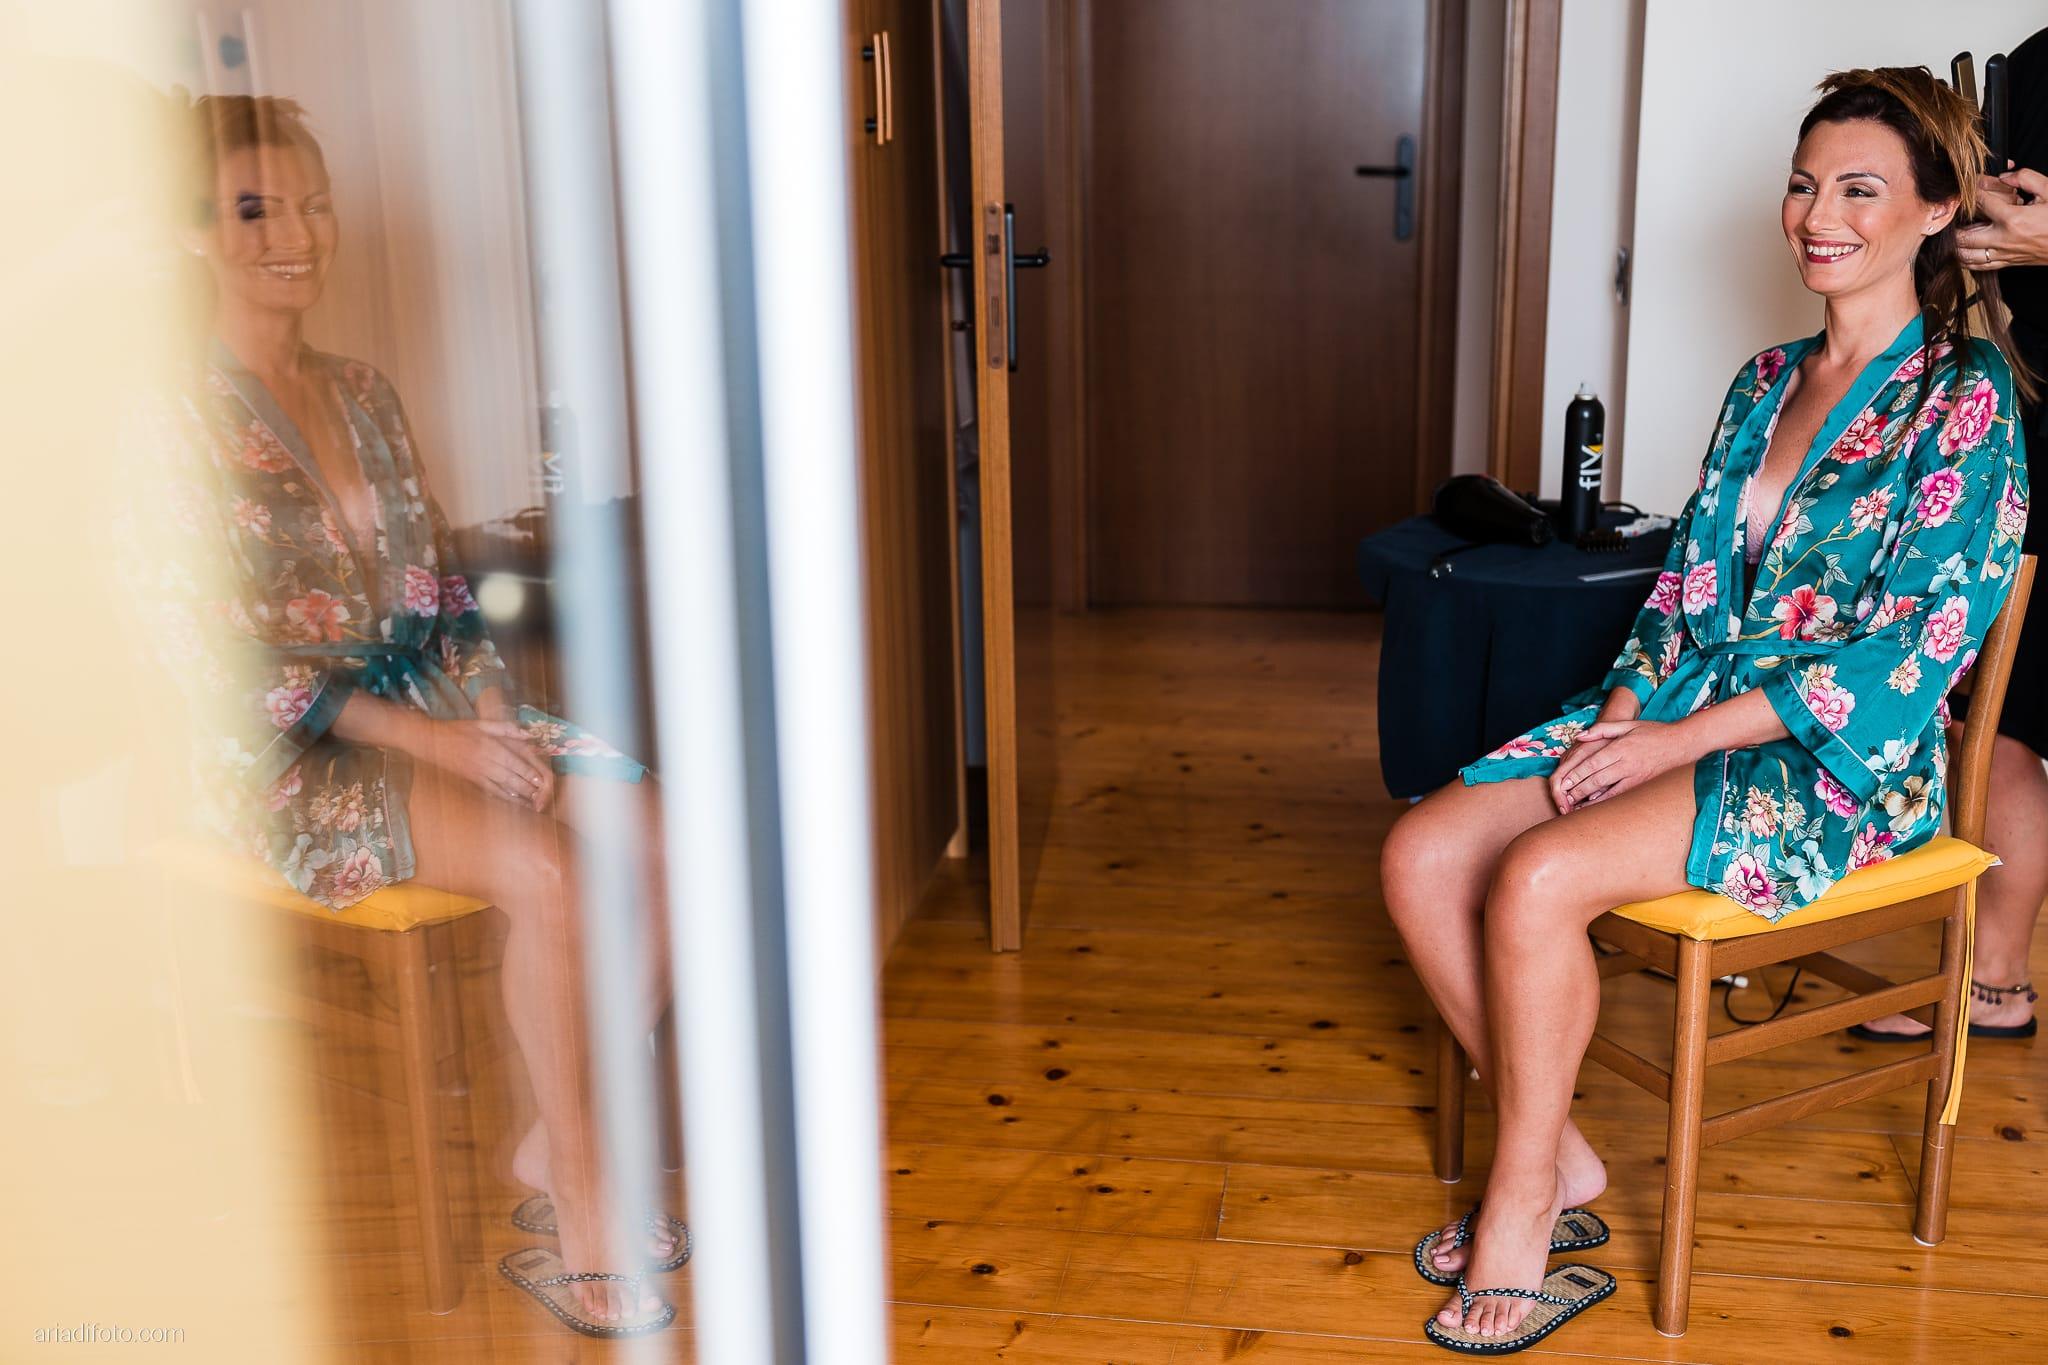 Stefania Raffaele Matrimonio Country Chic Outdoor Gorizia acconciatura